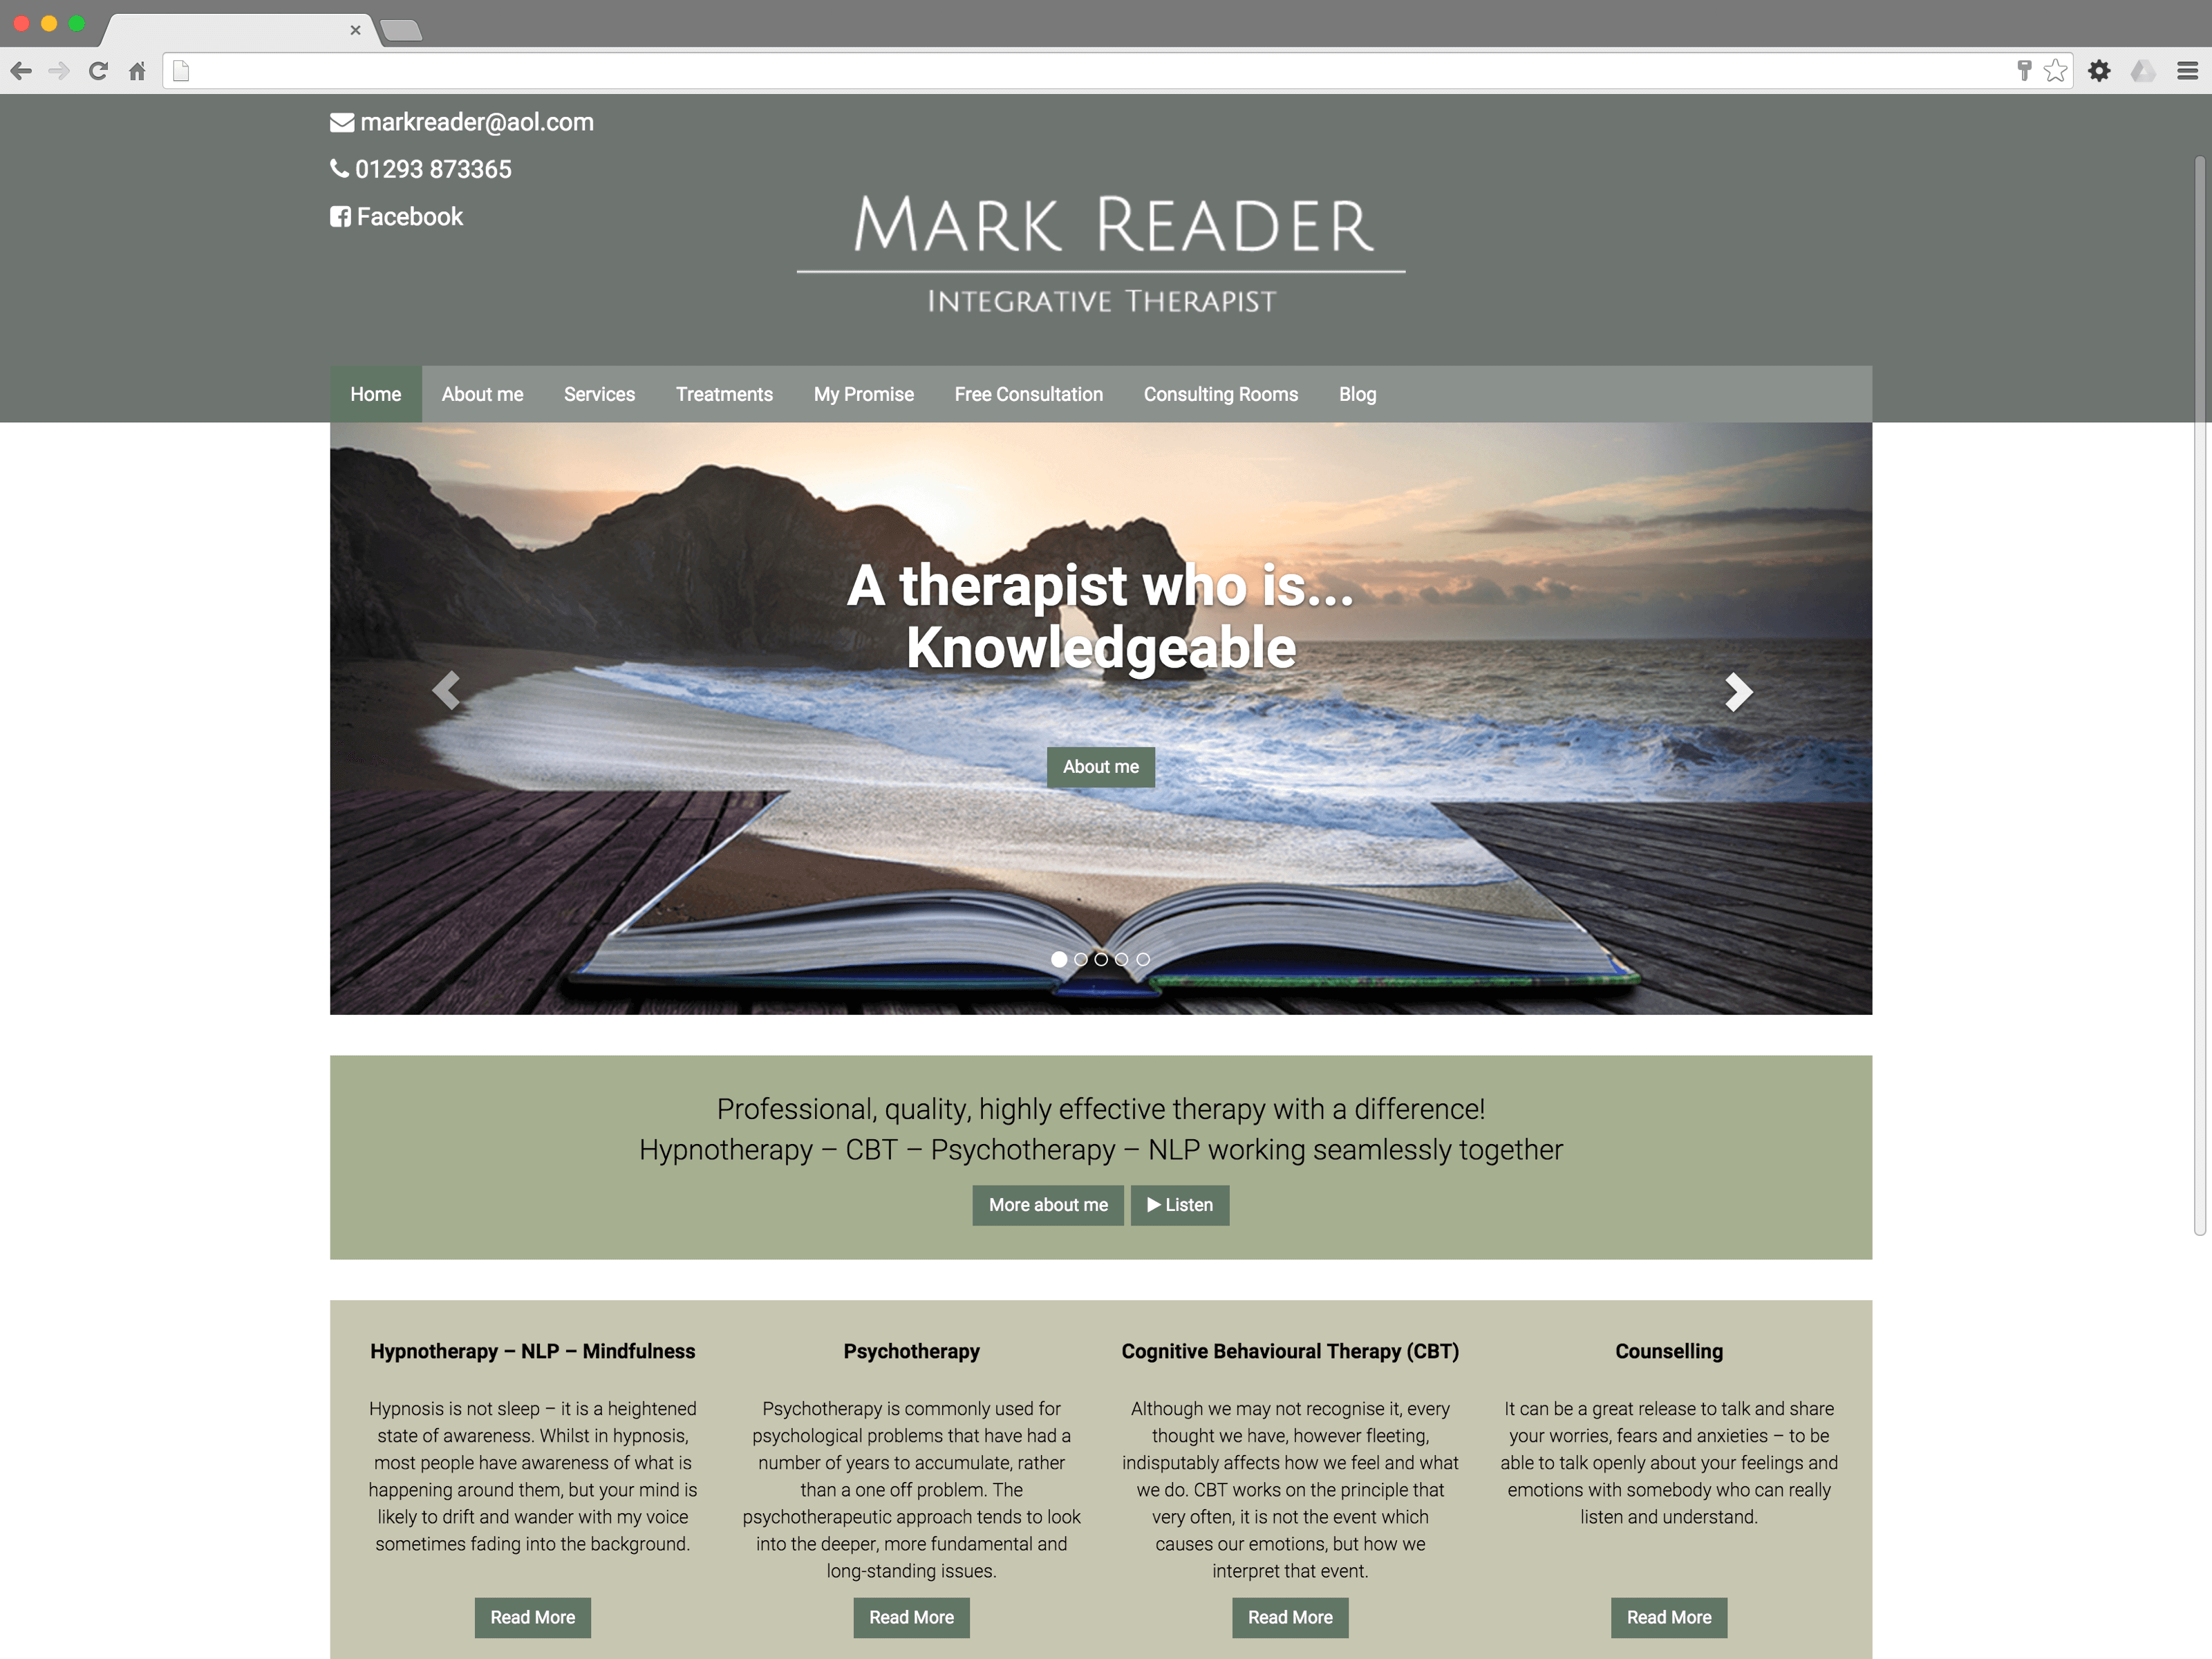 Mark Reader Integrative Therapist website (Website on desktop)